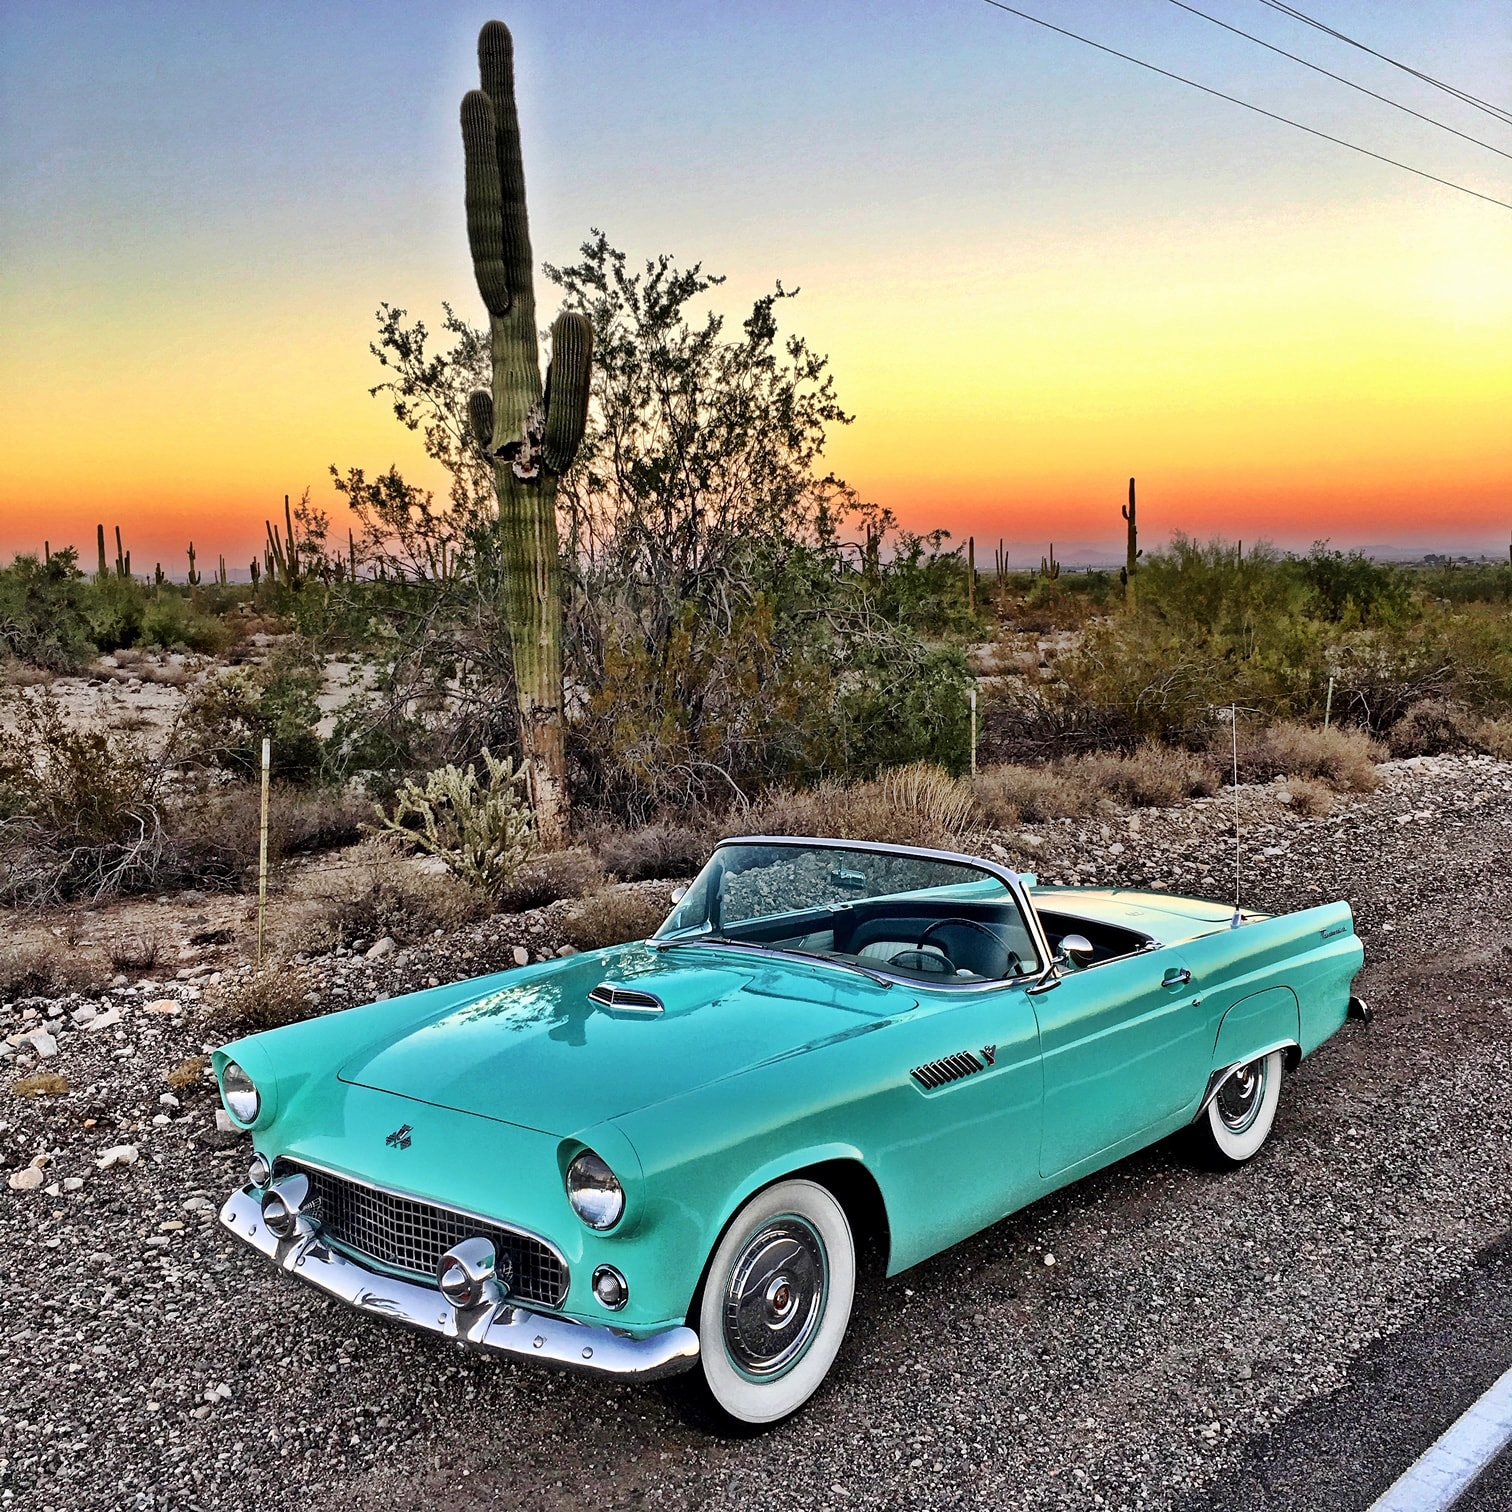 3rd Place -  Janine Badoino - Surprise, AZ - 1955 Ford Thunderbird